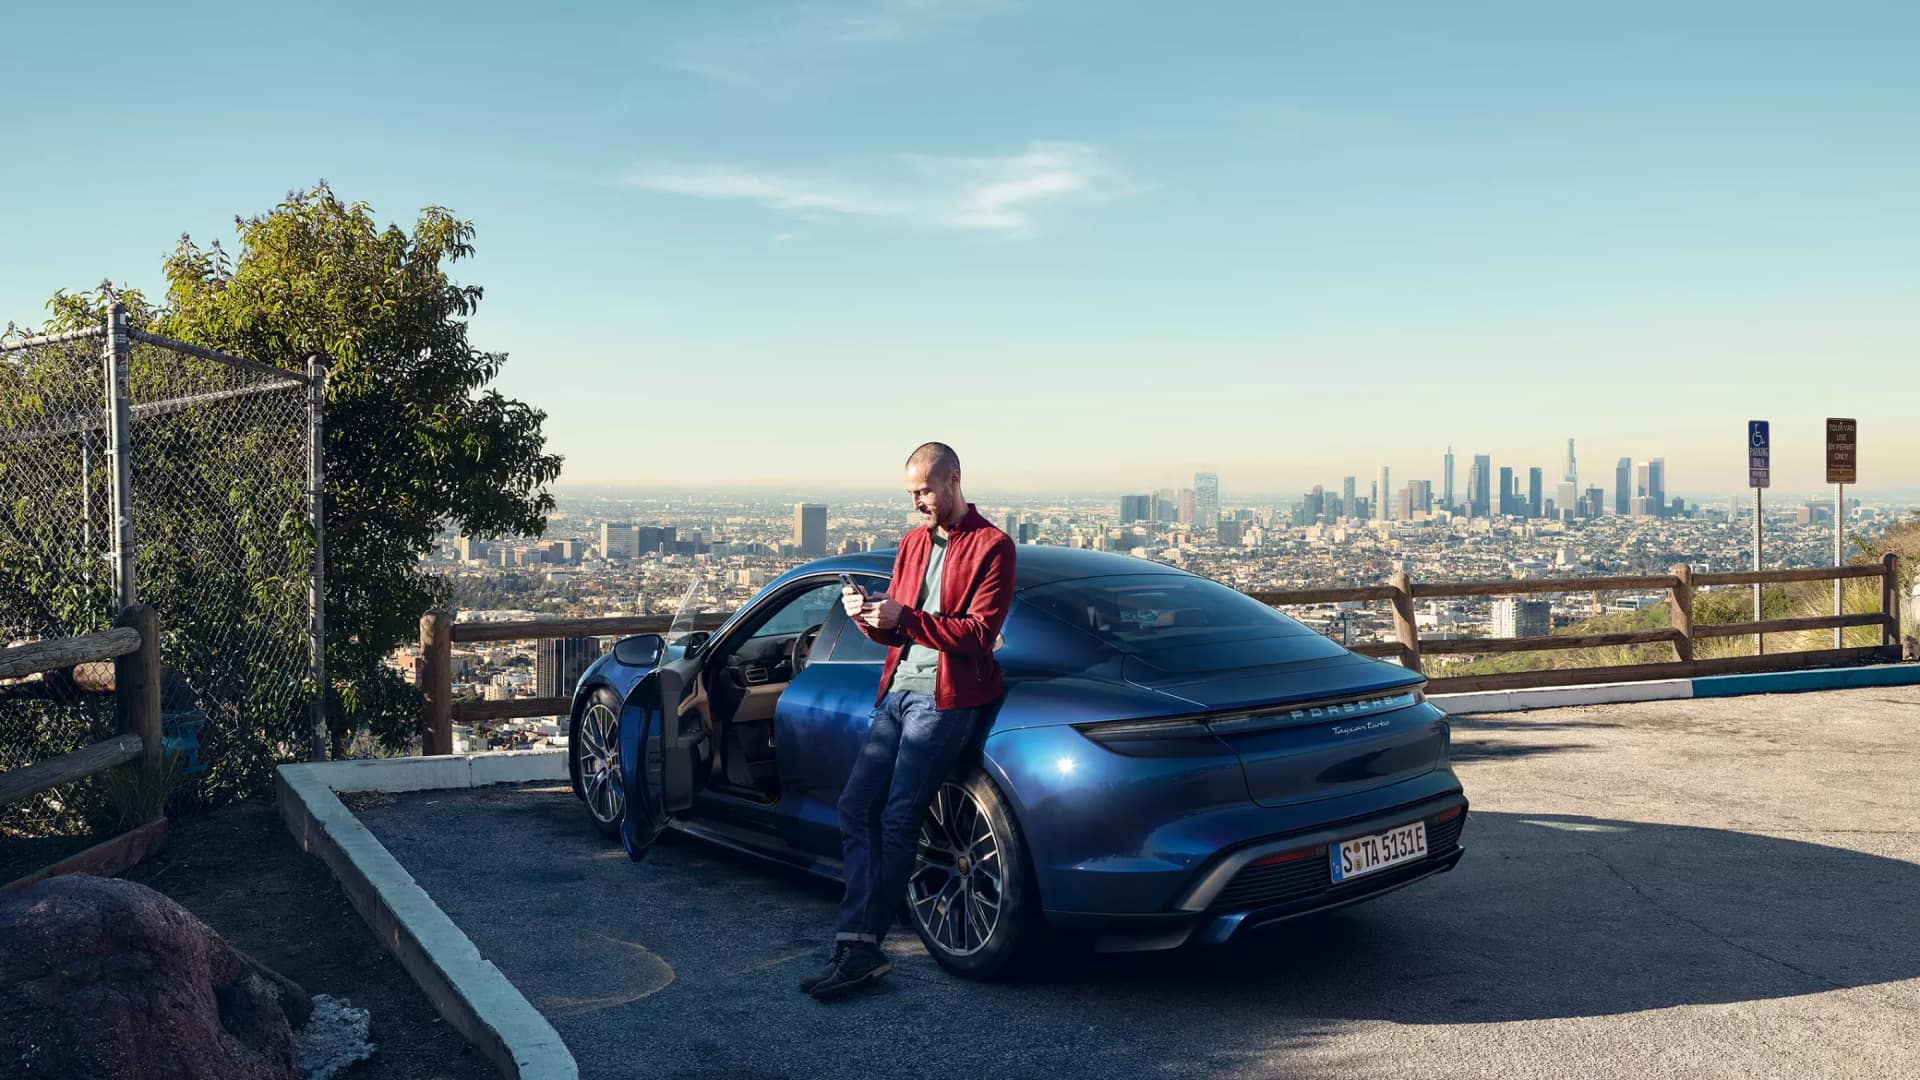 Porsche Financing in Beverly Hills, CA